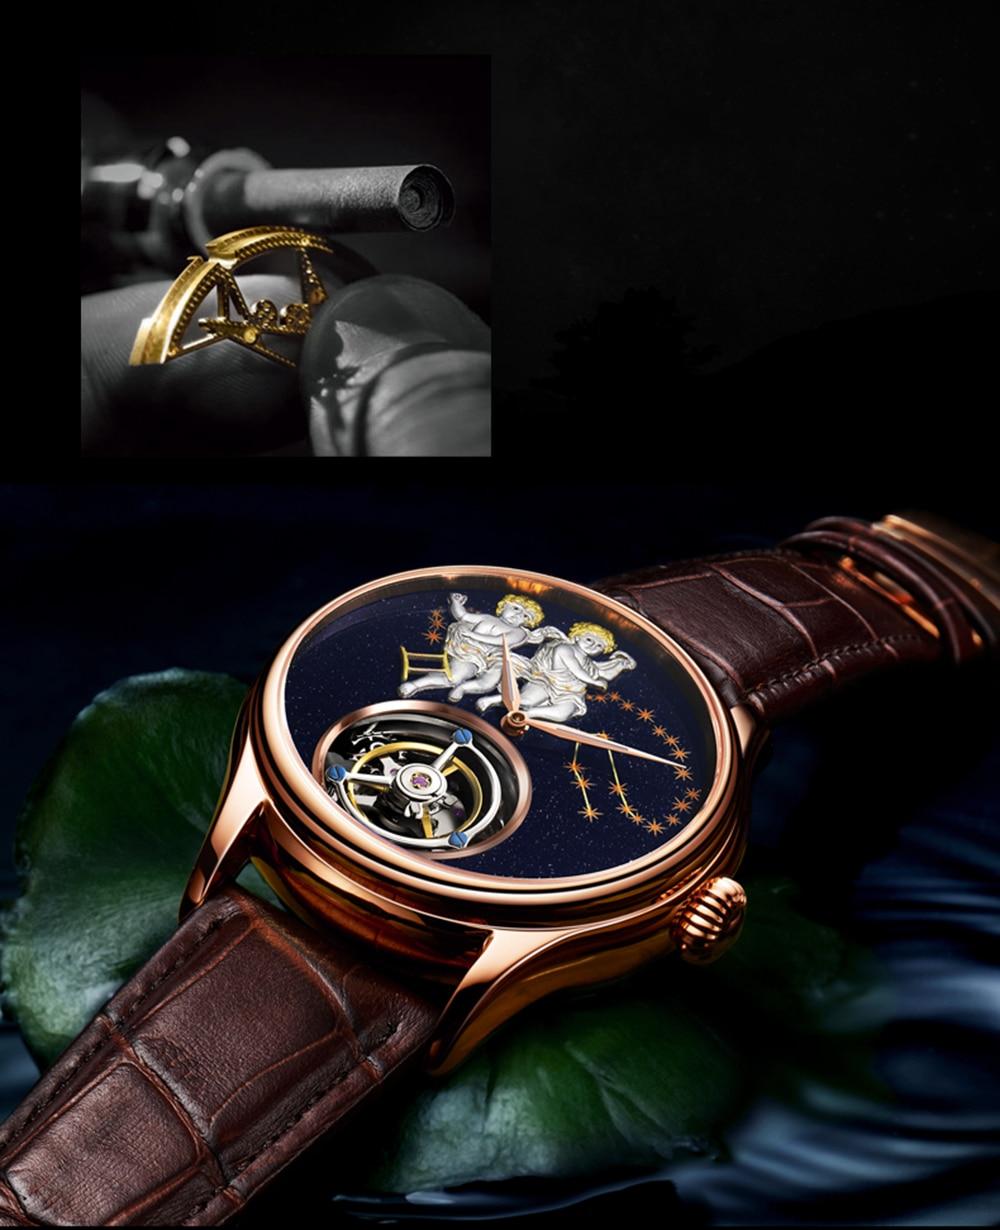 GUANQIN 2019 Real Tourbillon Mechanical Hand Wind Mens Watches Top Brand Luxury Gemini Clock men Gold Sapphire Relogio Masculino 14